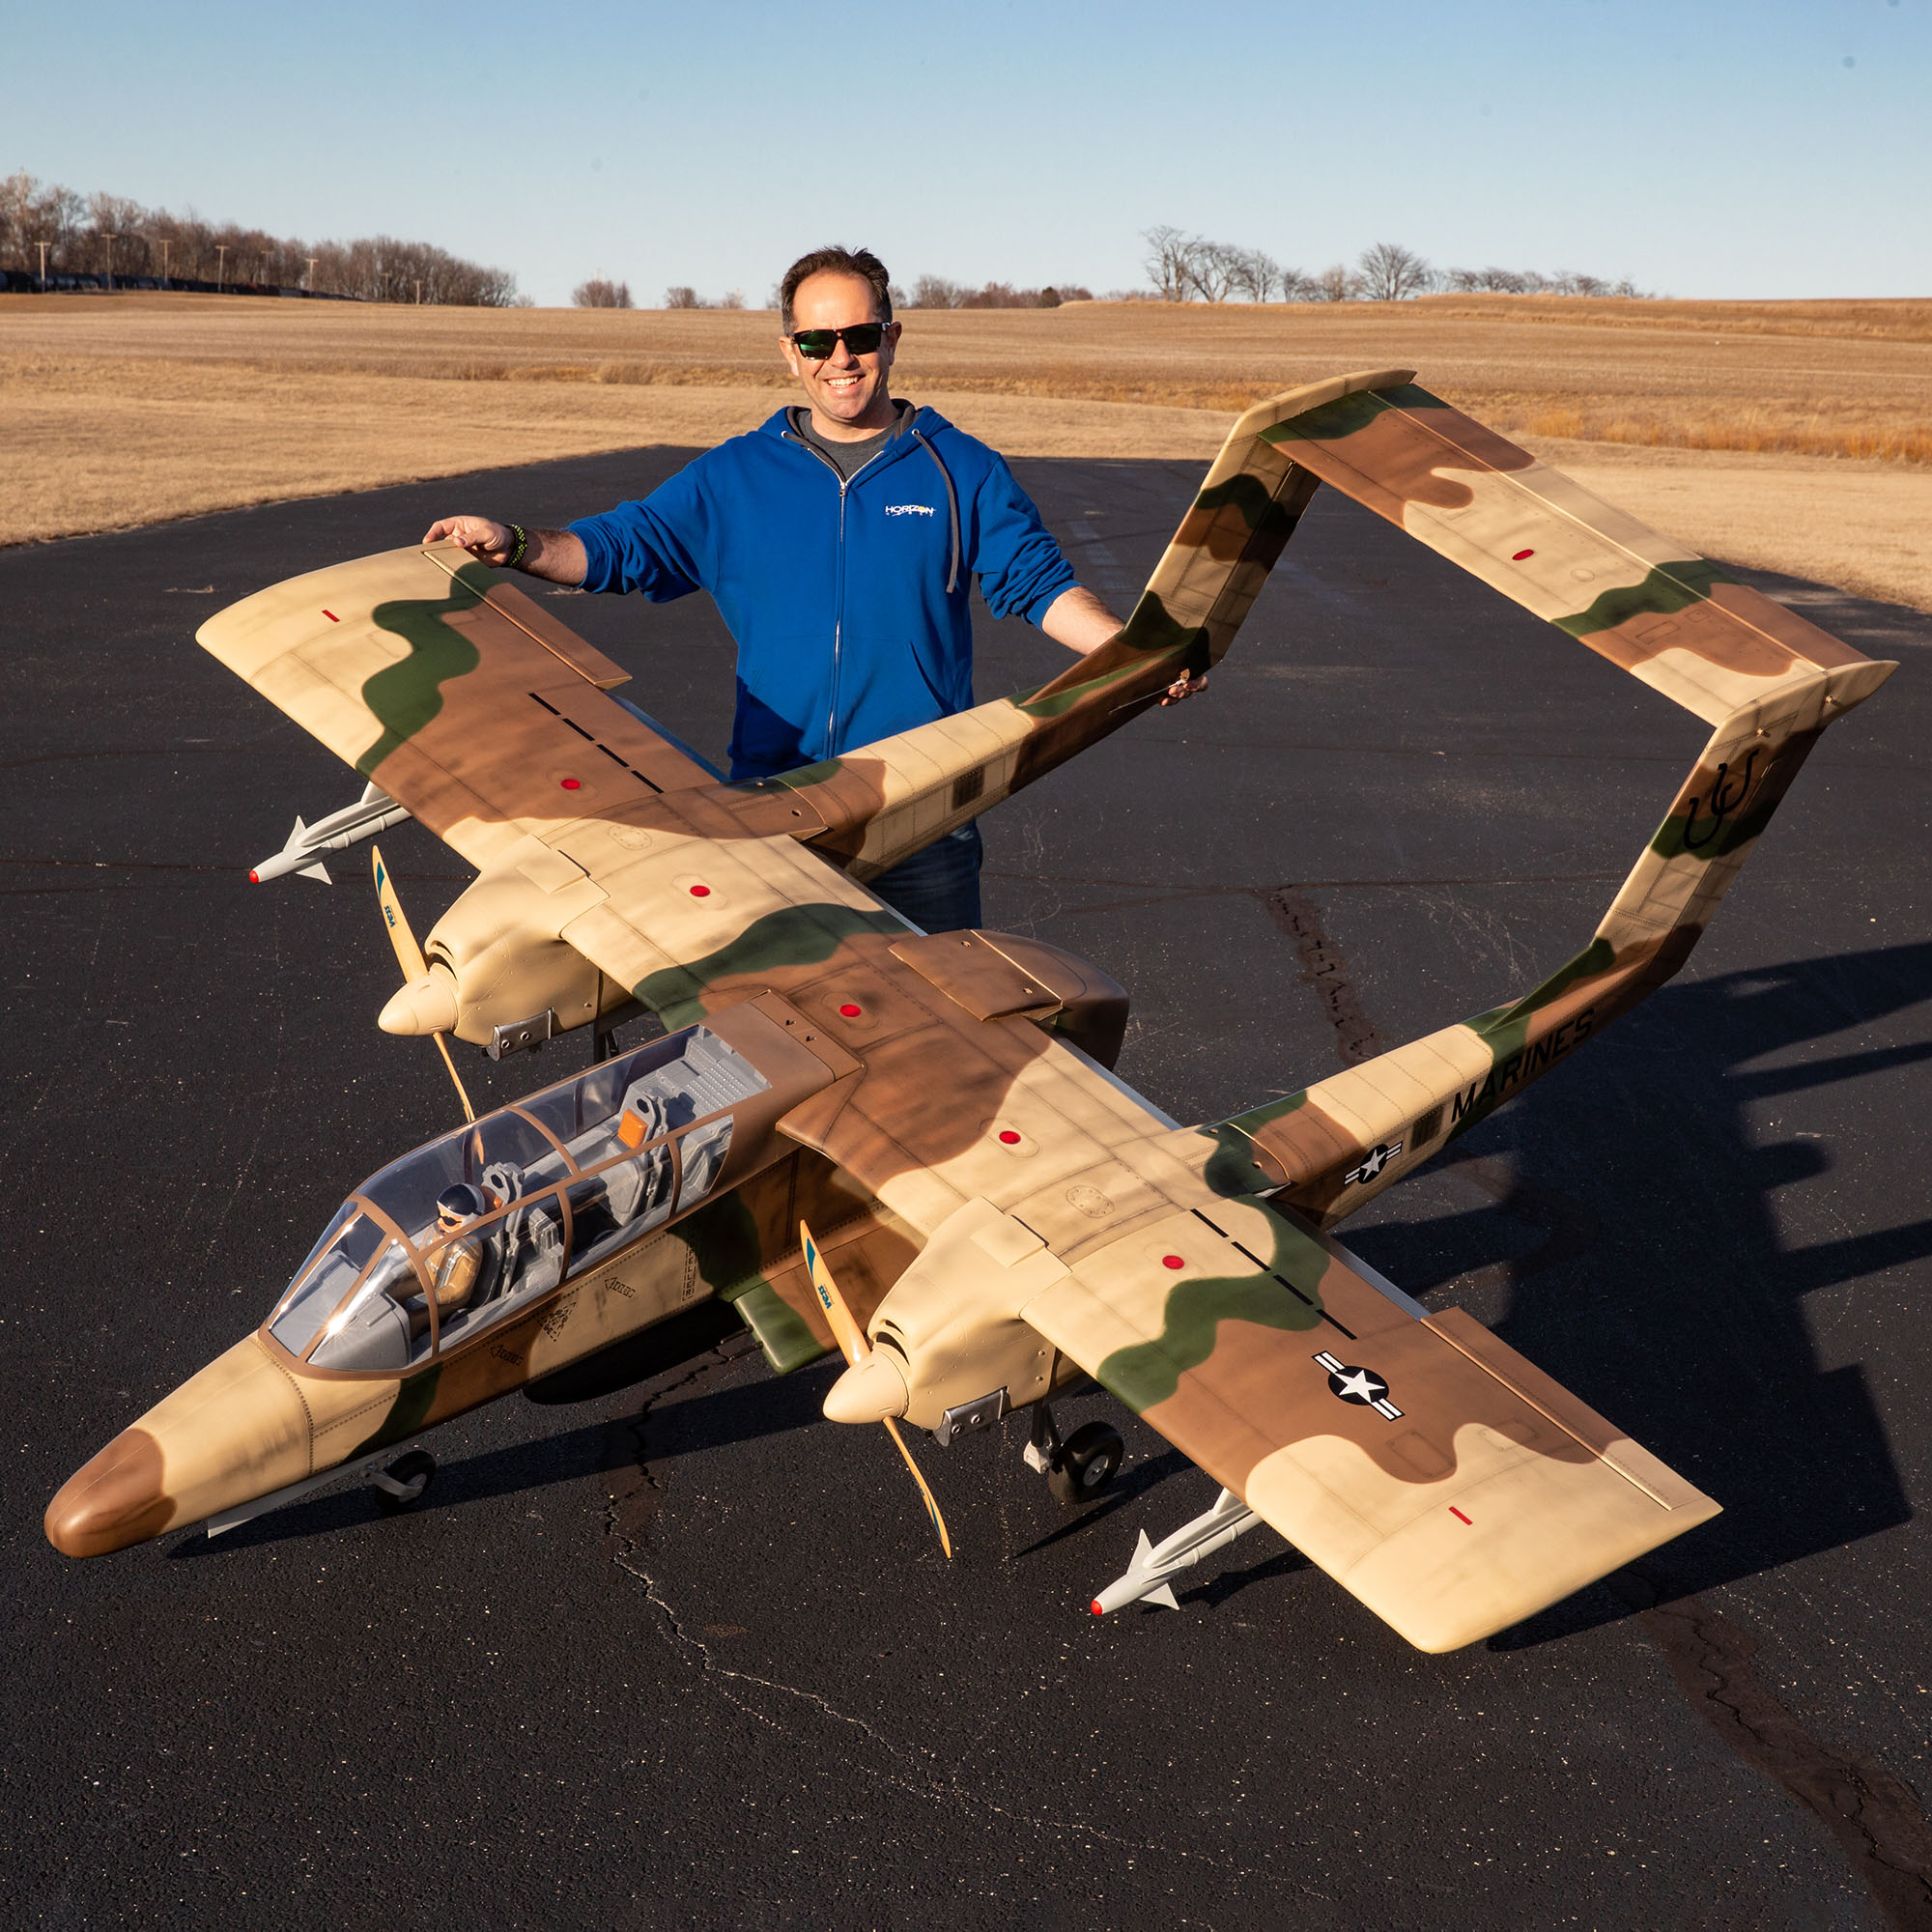 OV-10 Bronco hangar 9